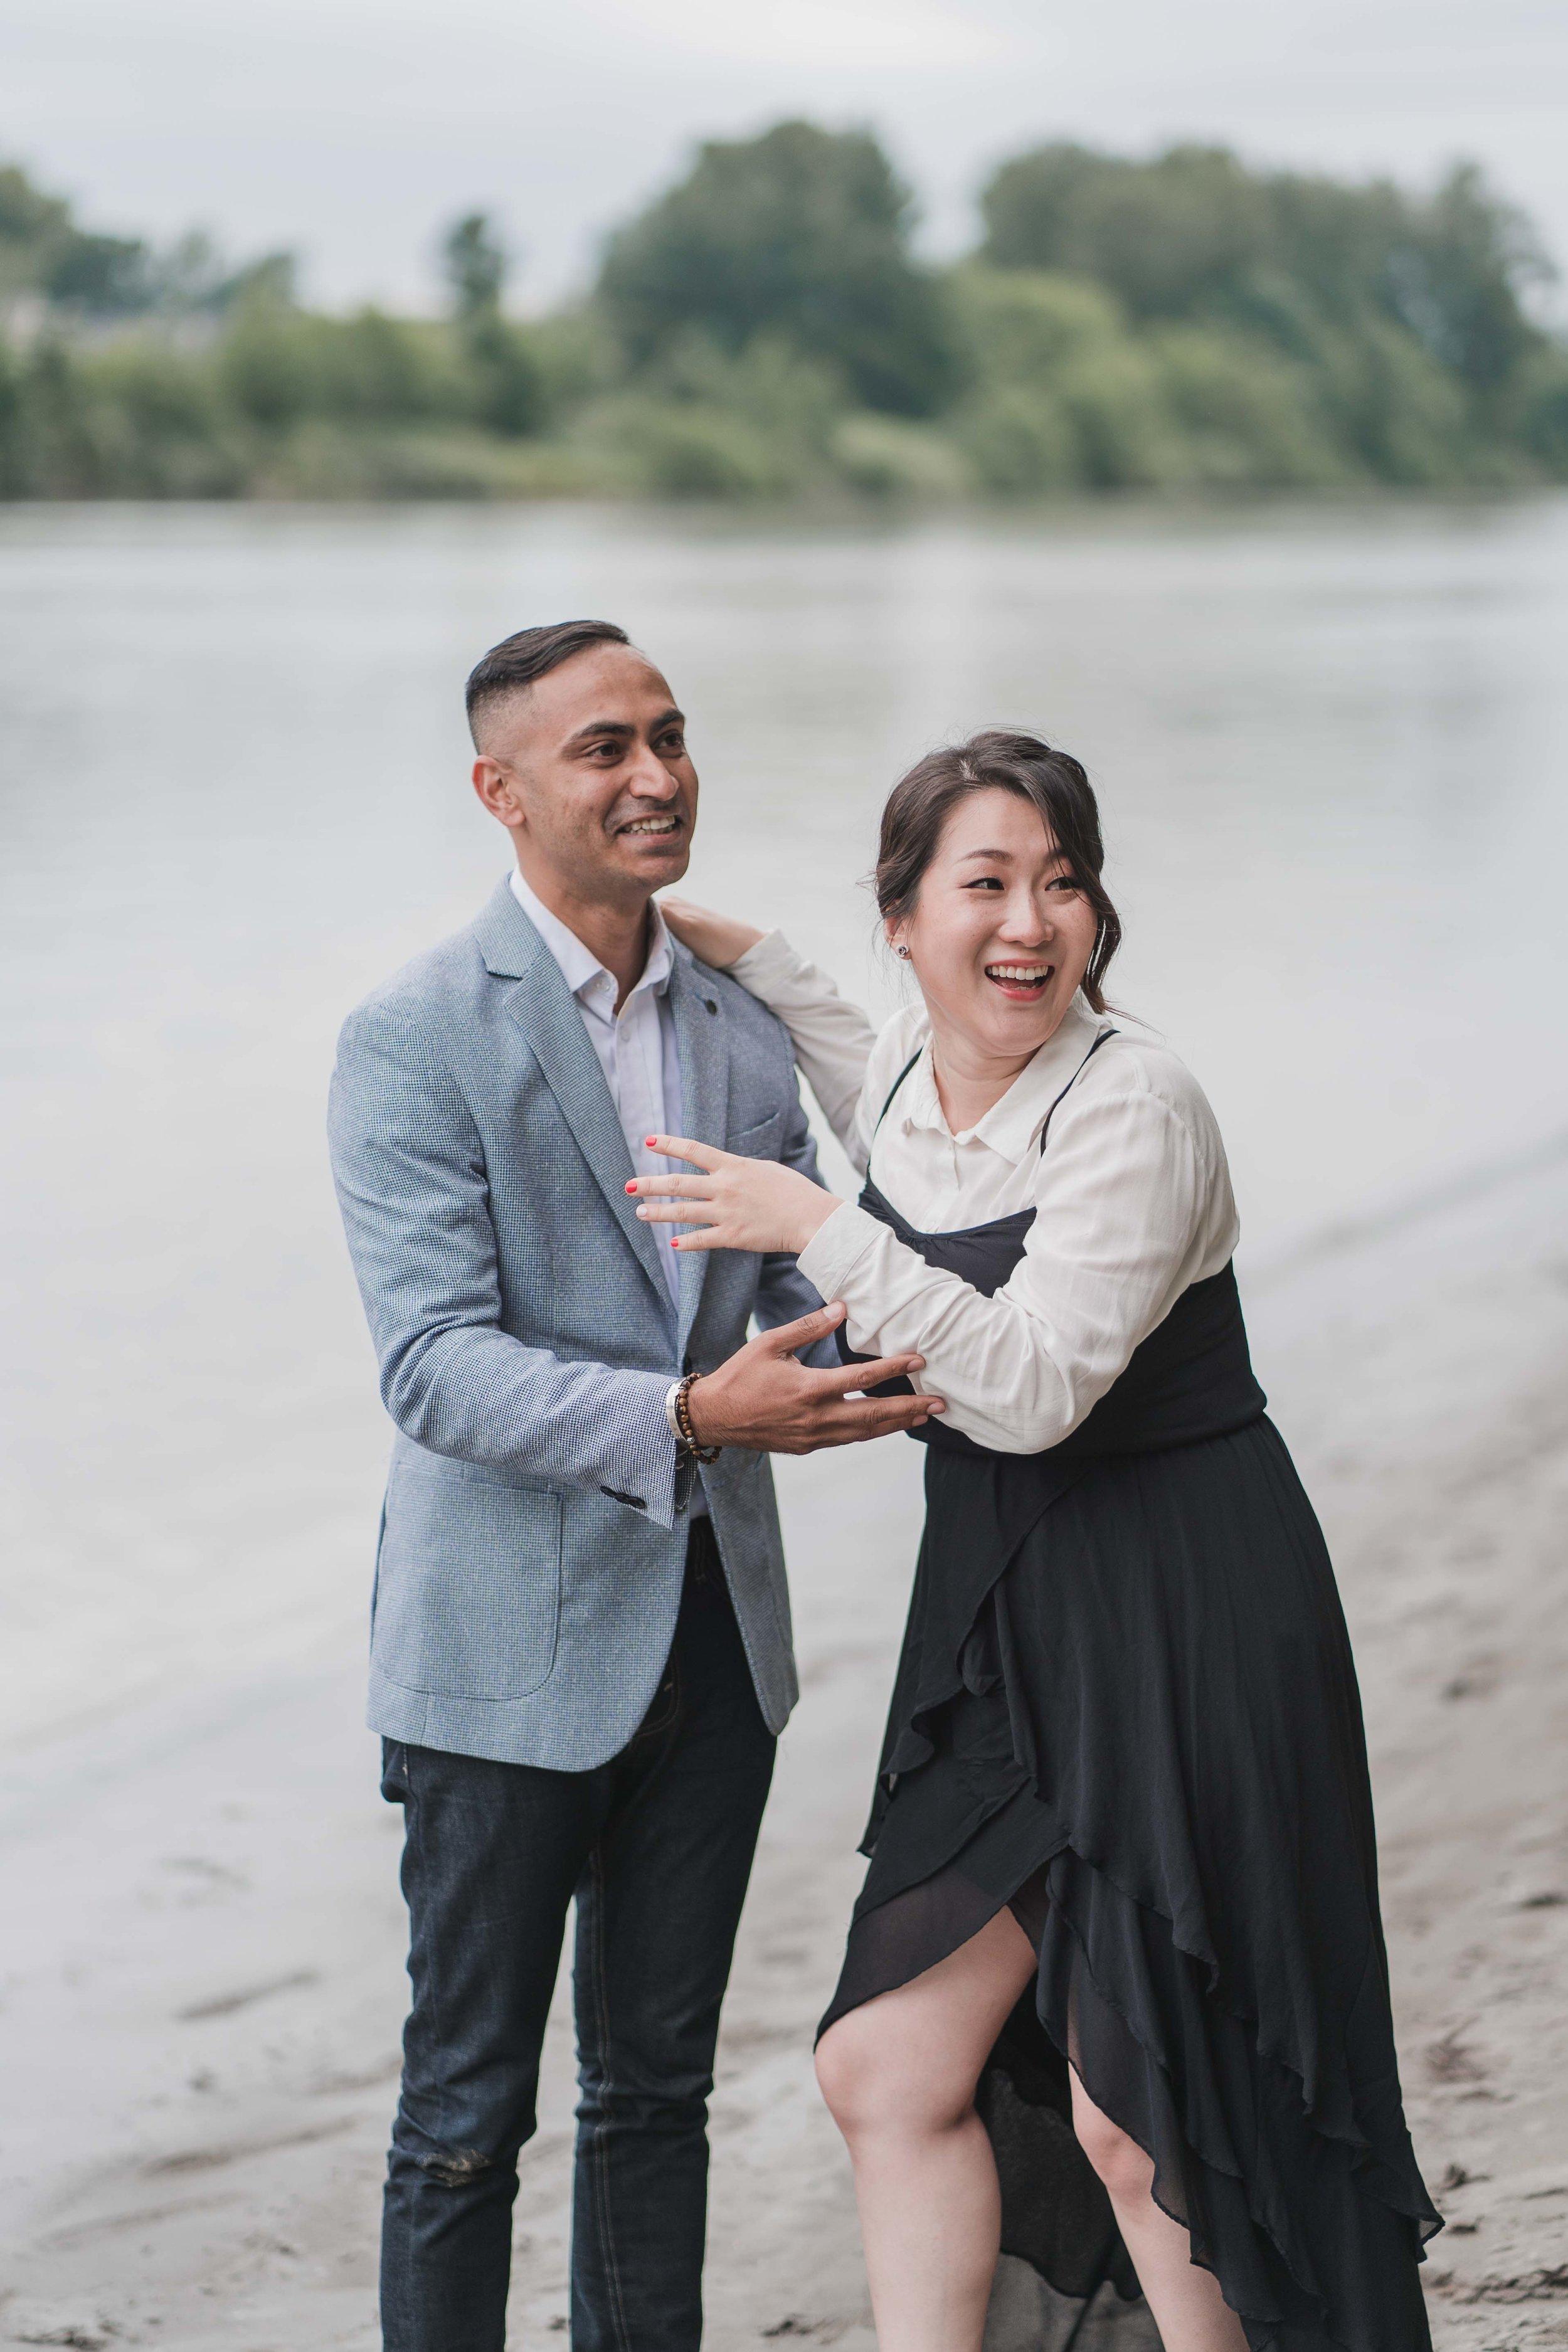 20190622 - Monika & Johnson Engagement - 0148.jpg